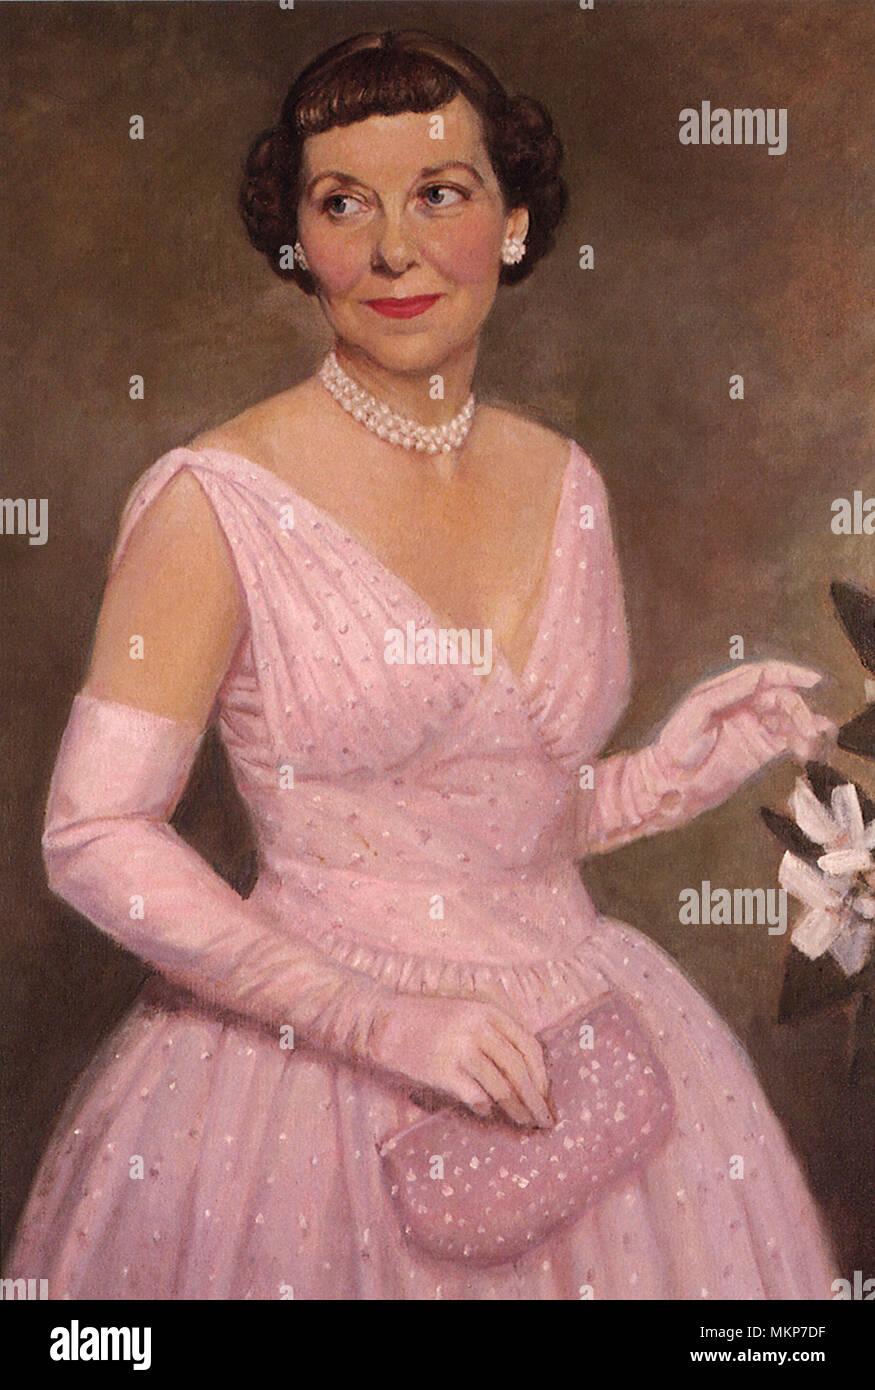 Mamie Eisenhower Imágenes De Stock & Mamie Eisenhower Fotos De Stock ...